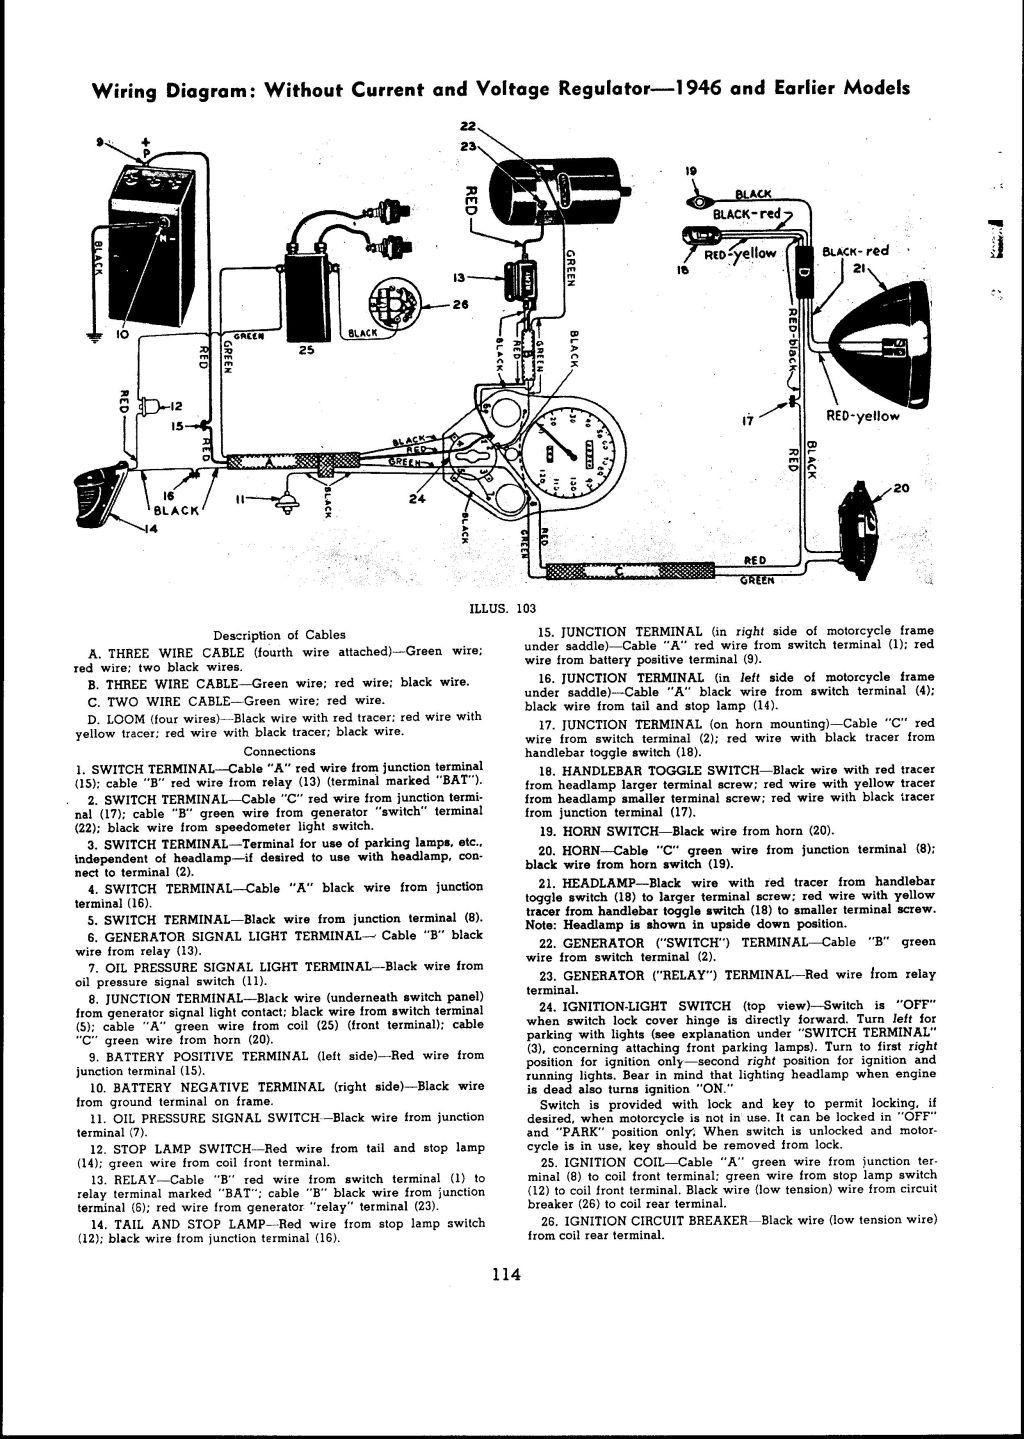 harley knucklehead wiring diagram wiring diagram for you harley davidson panhead wiring diagram 1941 harley davidson [ 1024 x 1439 Pixel ]